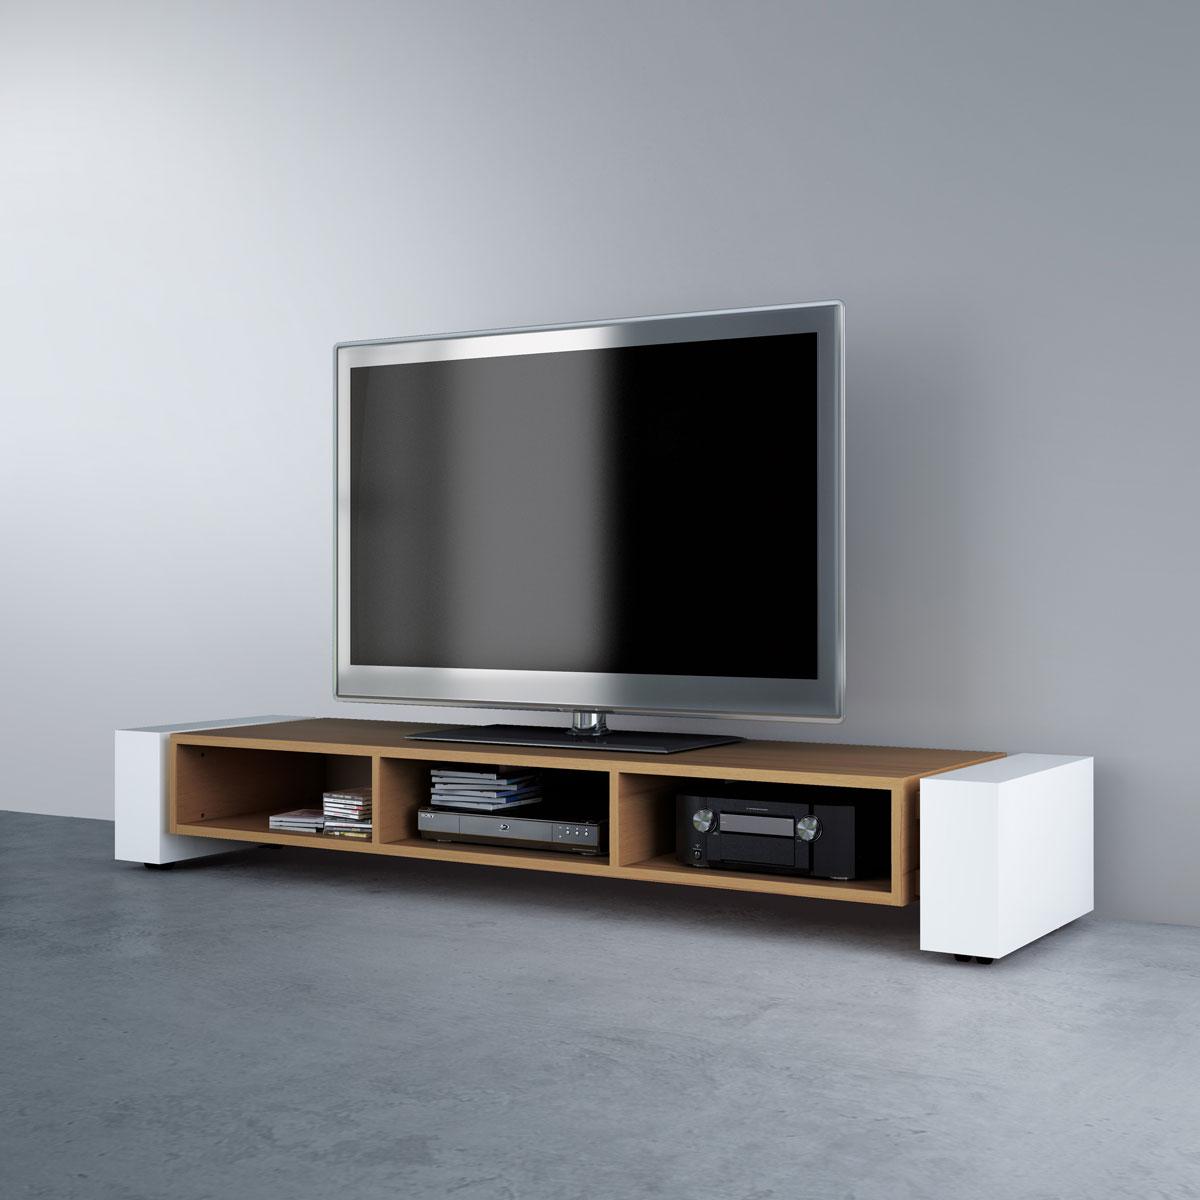 tv mobel mit halterung archive tv mobel und hifi mobel guide